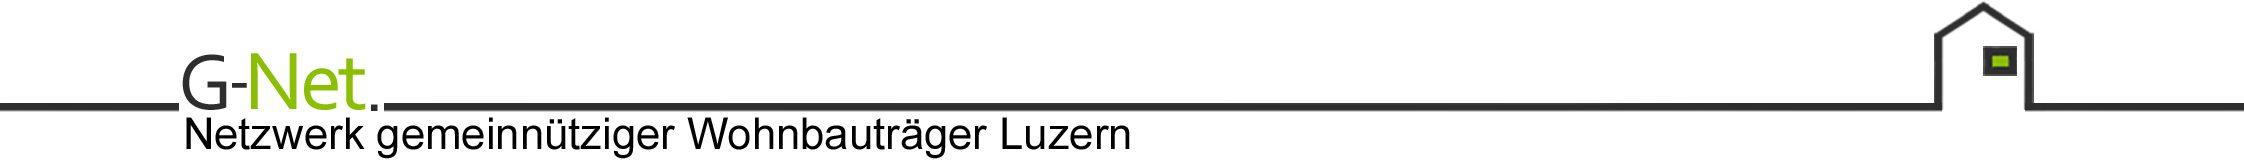 G-Net Luzern